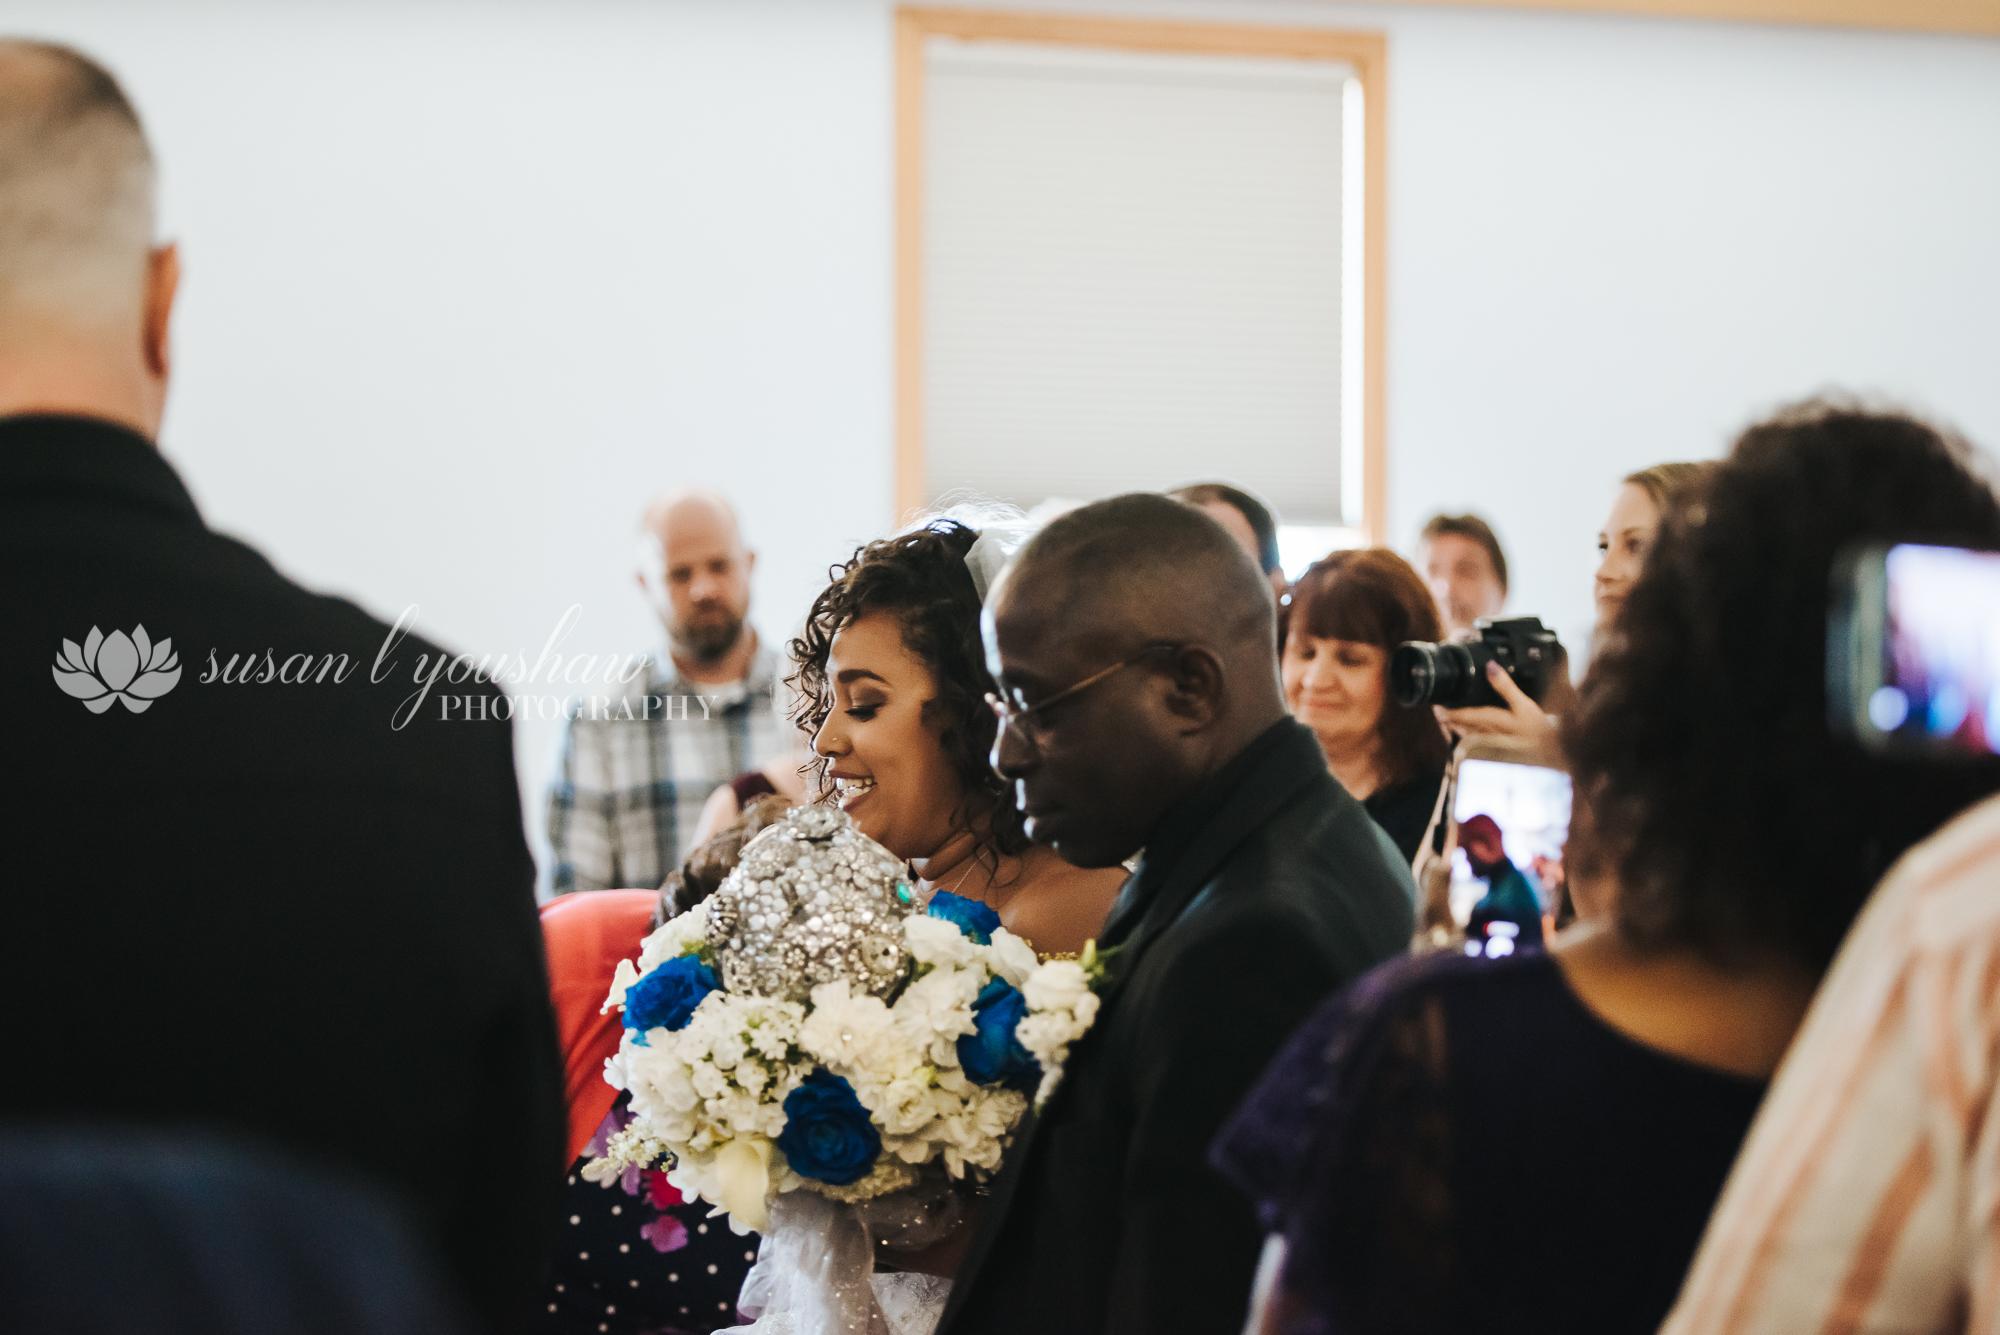 Katelyn and Wes Wedding Photos 07-13-2019 SLY Photography-55.jpg